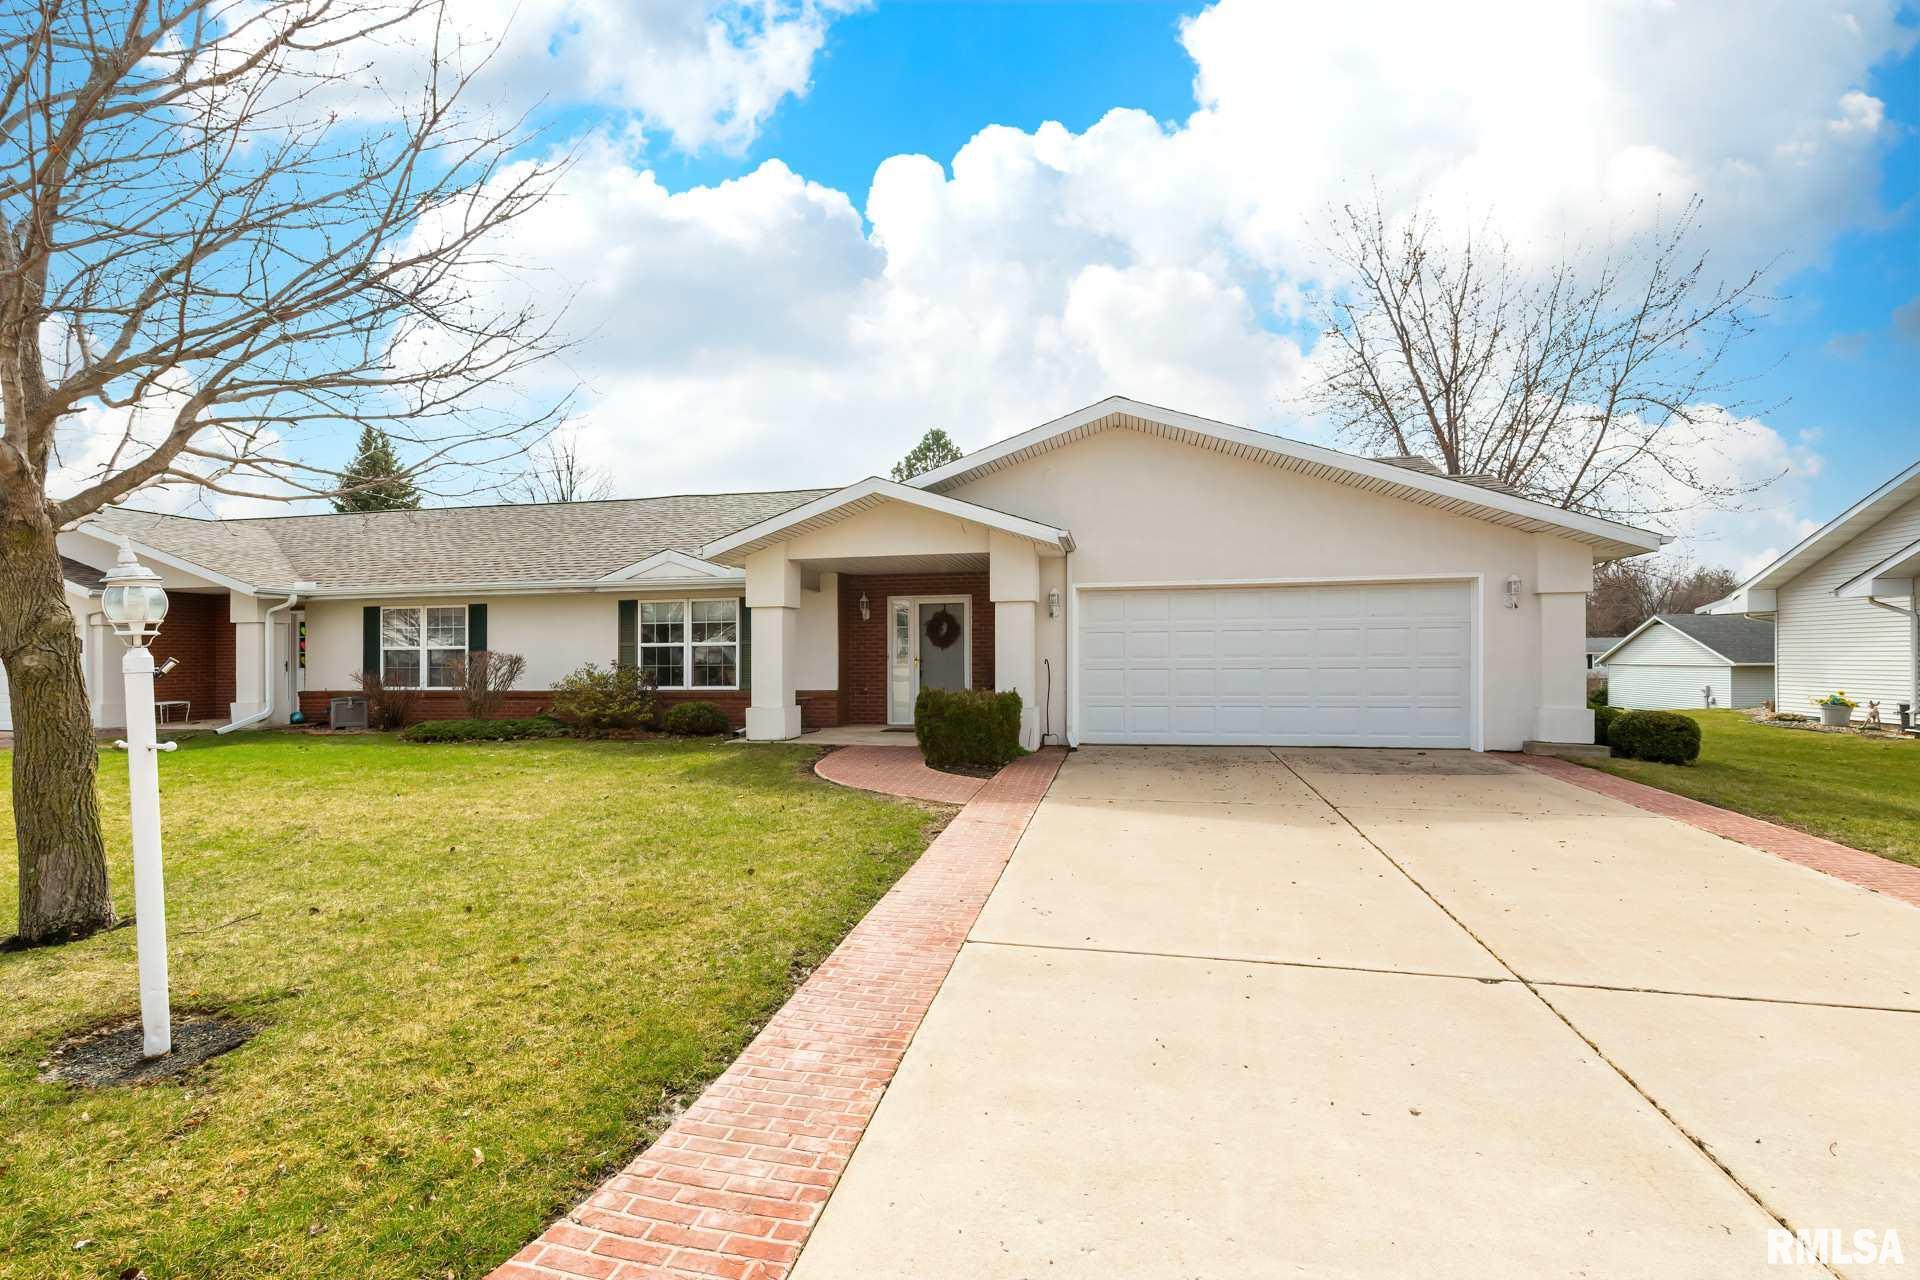 845 SUNSET Property Photo - Kewanee, IL real estate listing